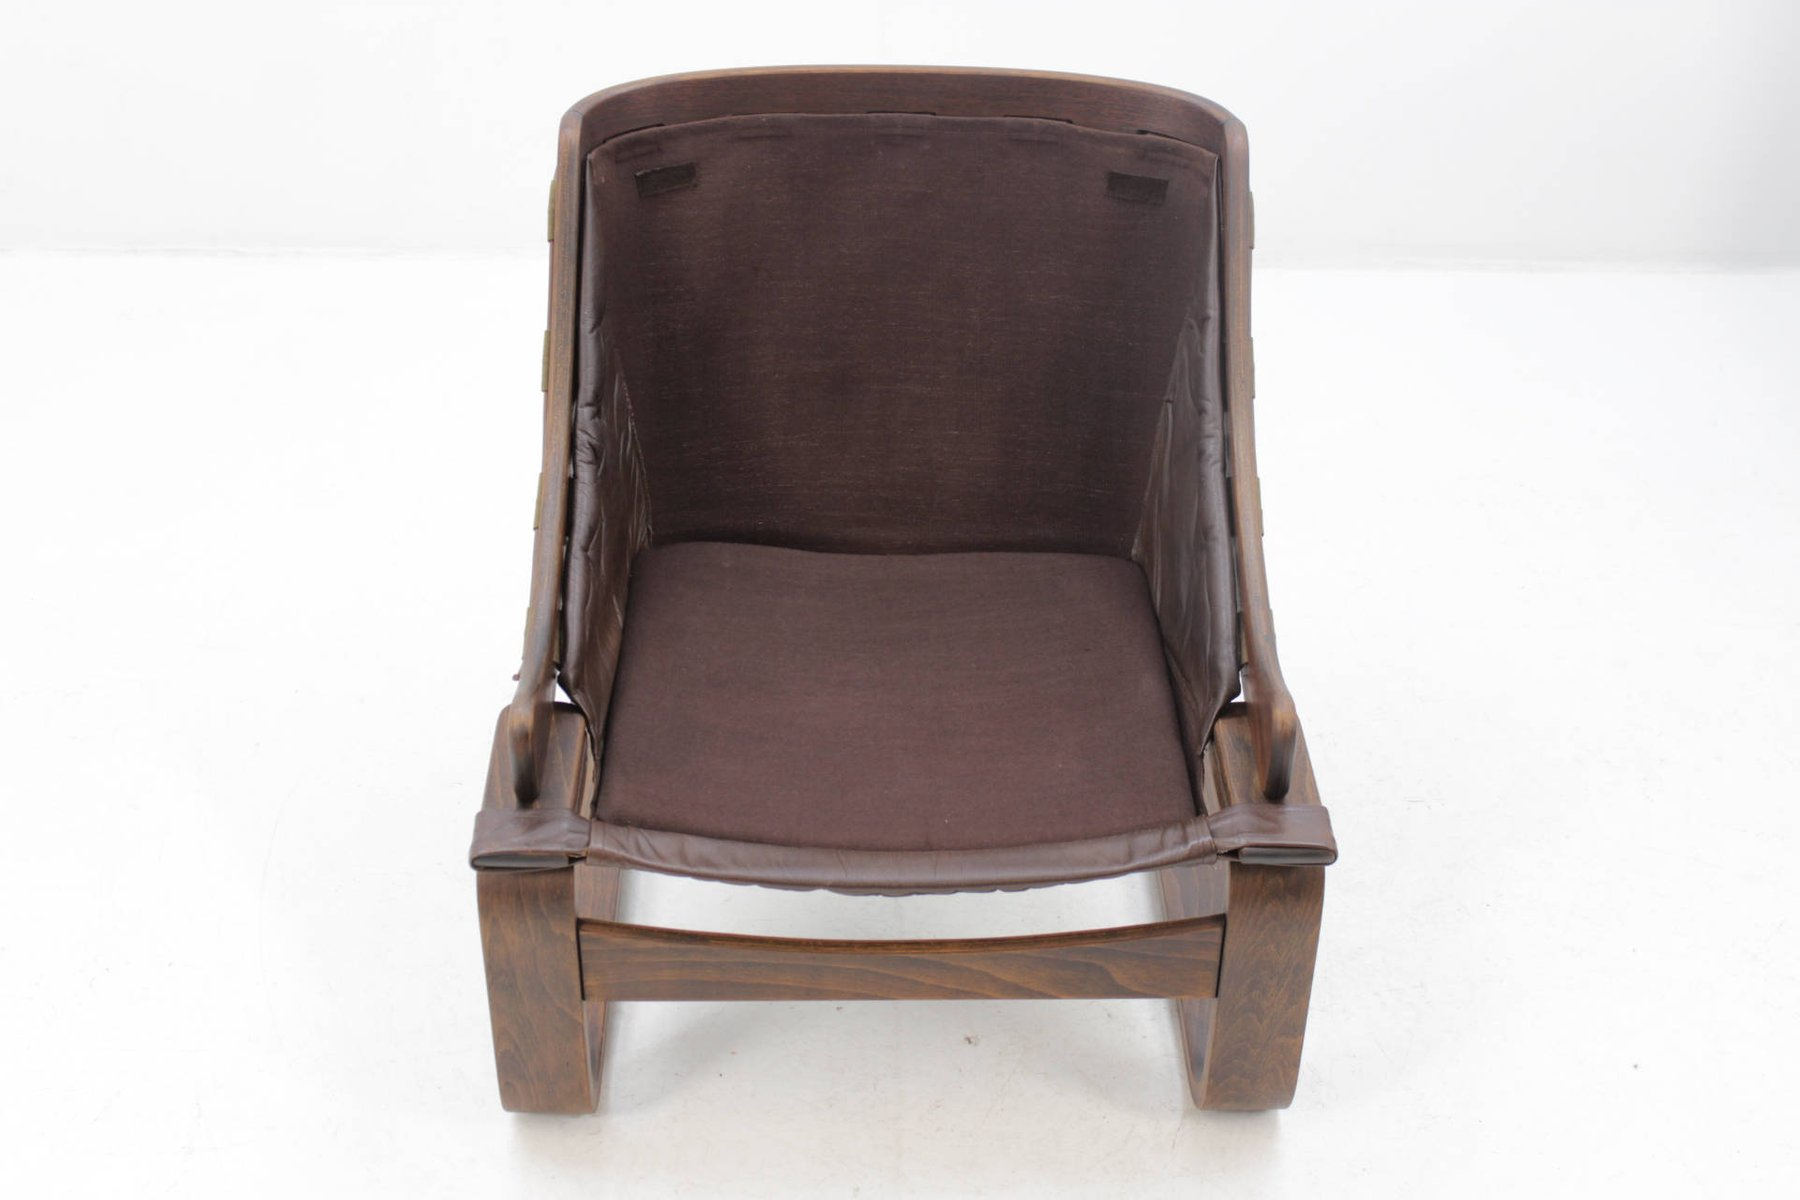 skandinavischer sessel aus bugholz und leder von ake fribytter f r nelo m bel 1970er bei pamono. Black Bedroom Furniture Sets. Home Design Ideas